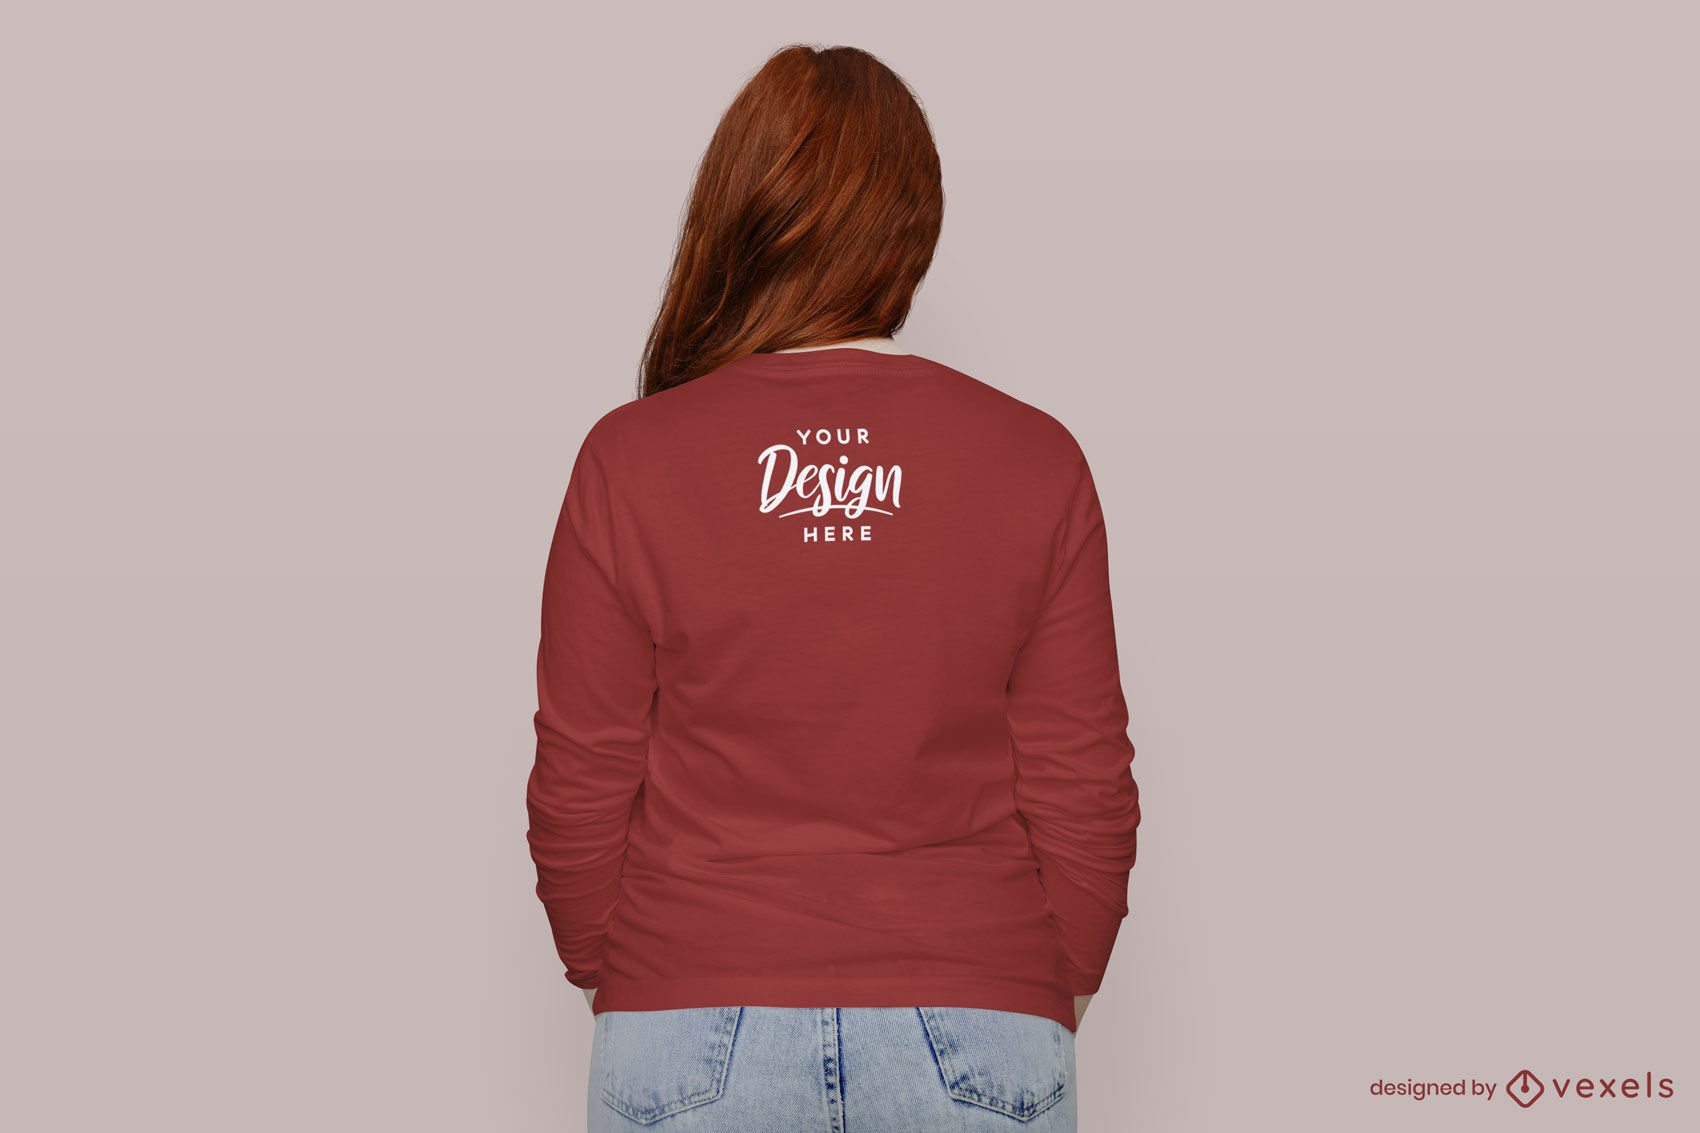 Chica en maqueta de espalda de camiseta roja de manga larga